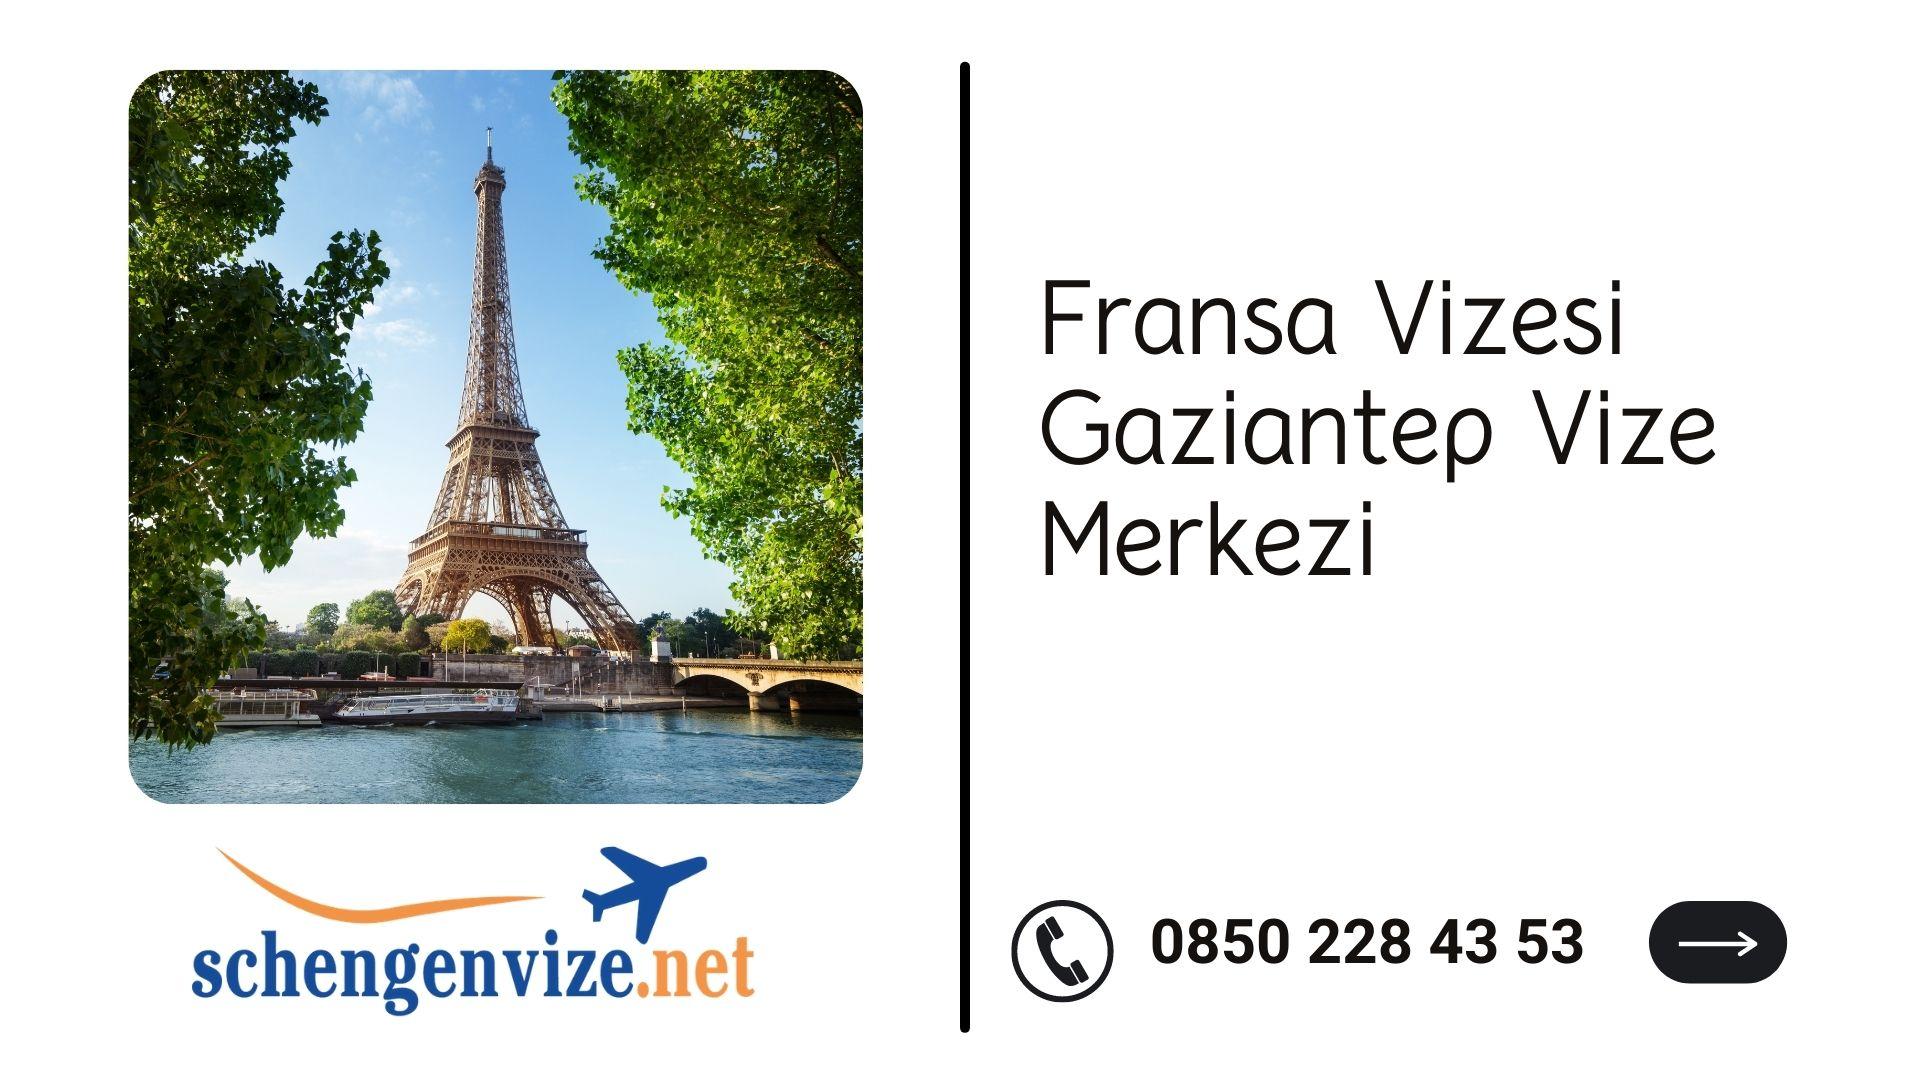 Fransa Vizesi Gaziantep Vize Merkezi